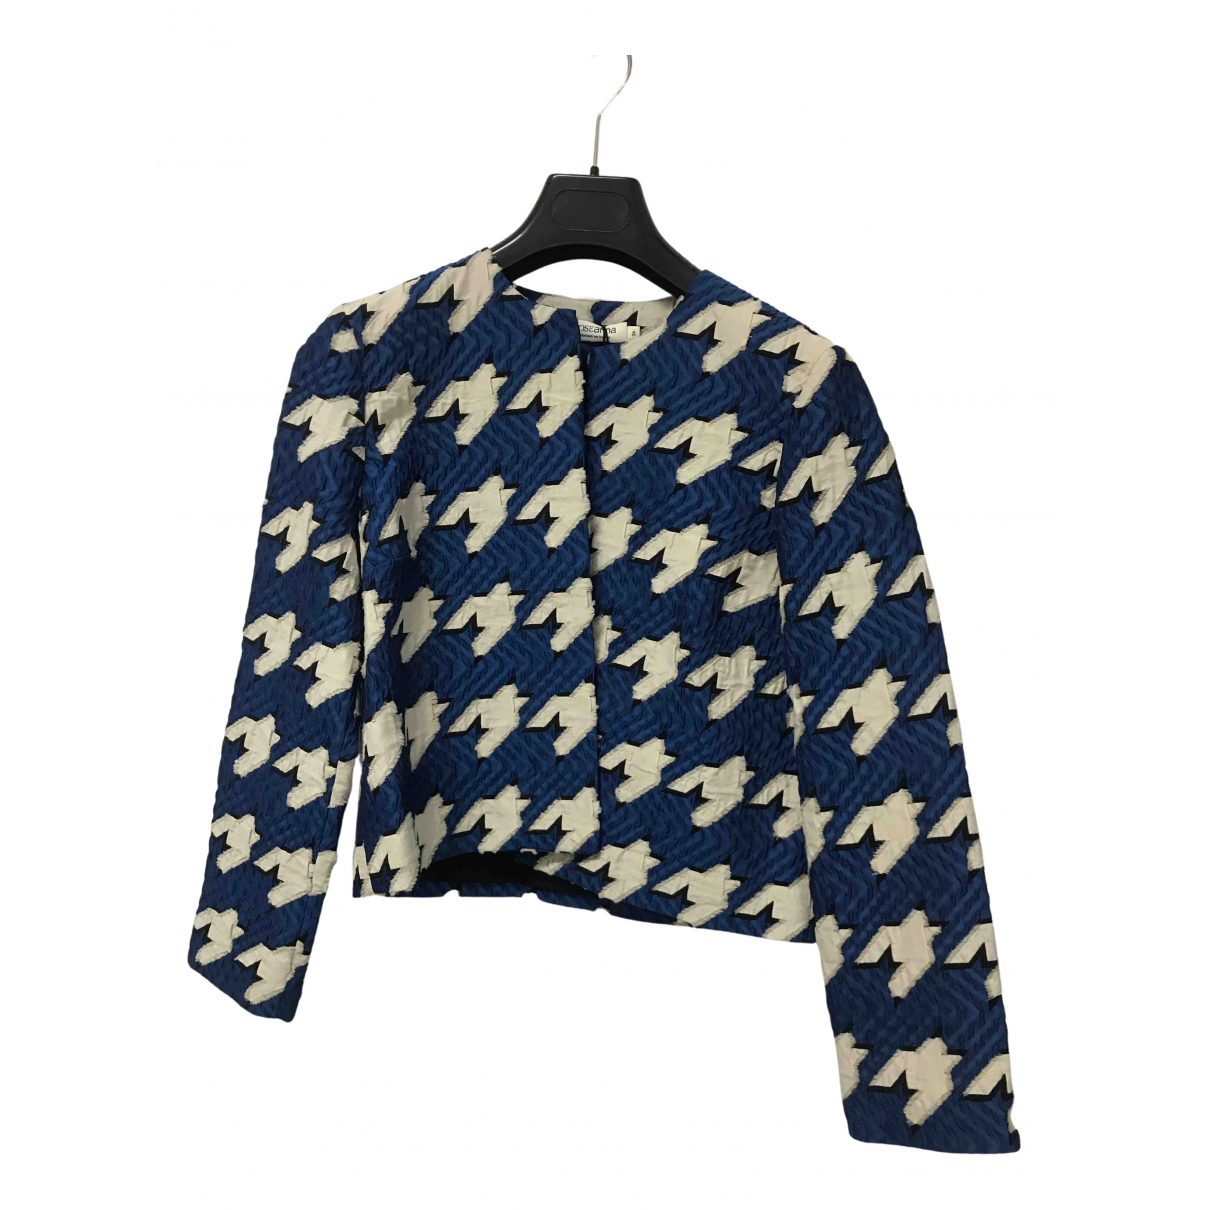 Roseanna \N Jacke in  Blau Wolle